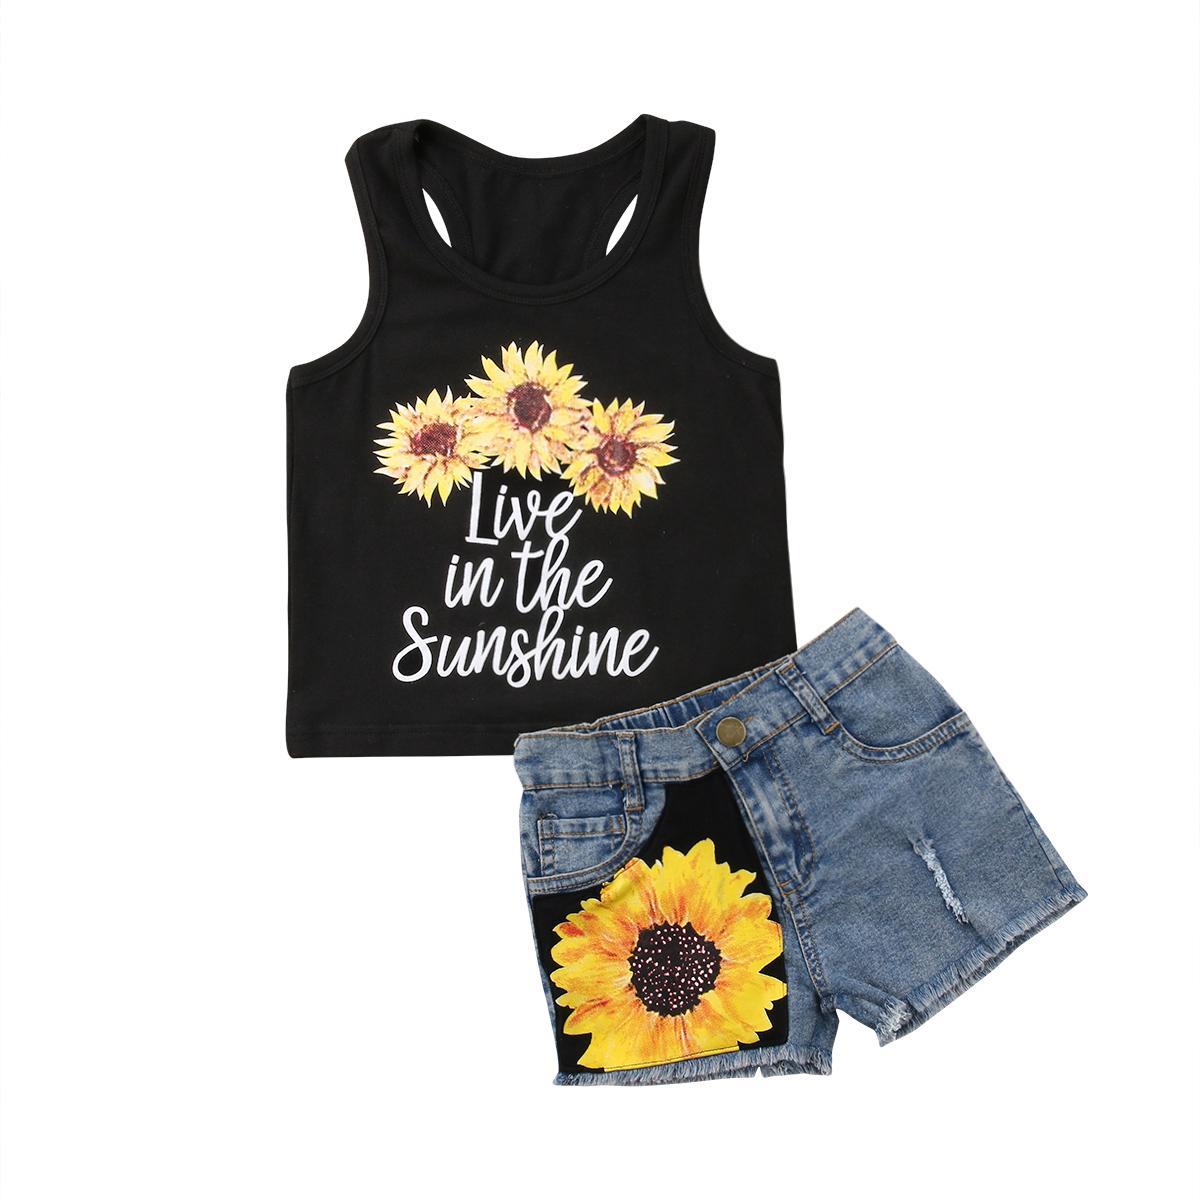 Toddler Kid Baby Girl Summer Top T-shirt+ sunflower Short Pants Outfit Set Clothes 2pcs Set